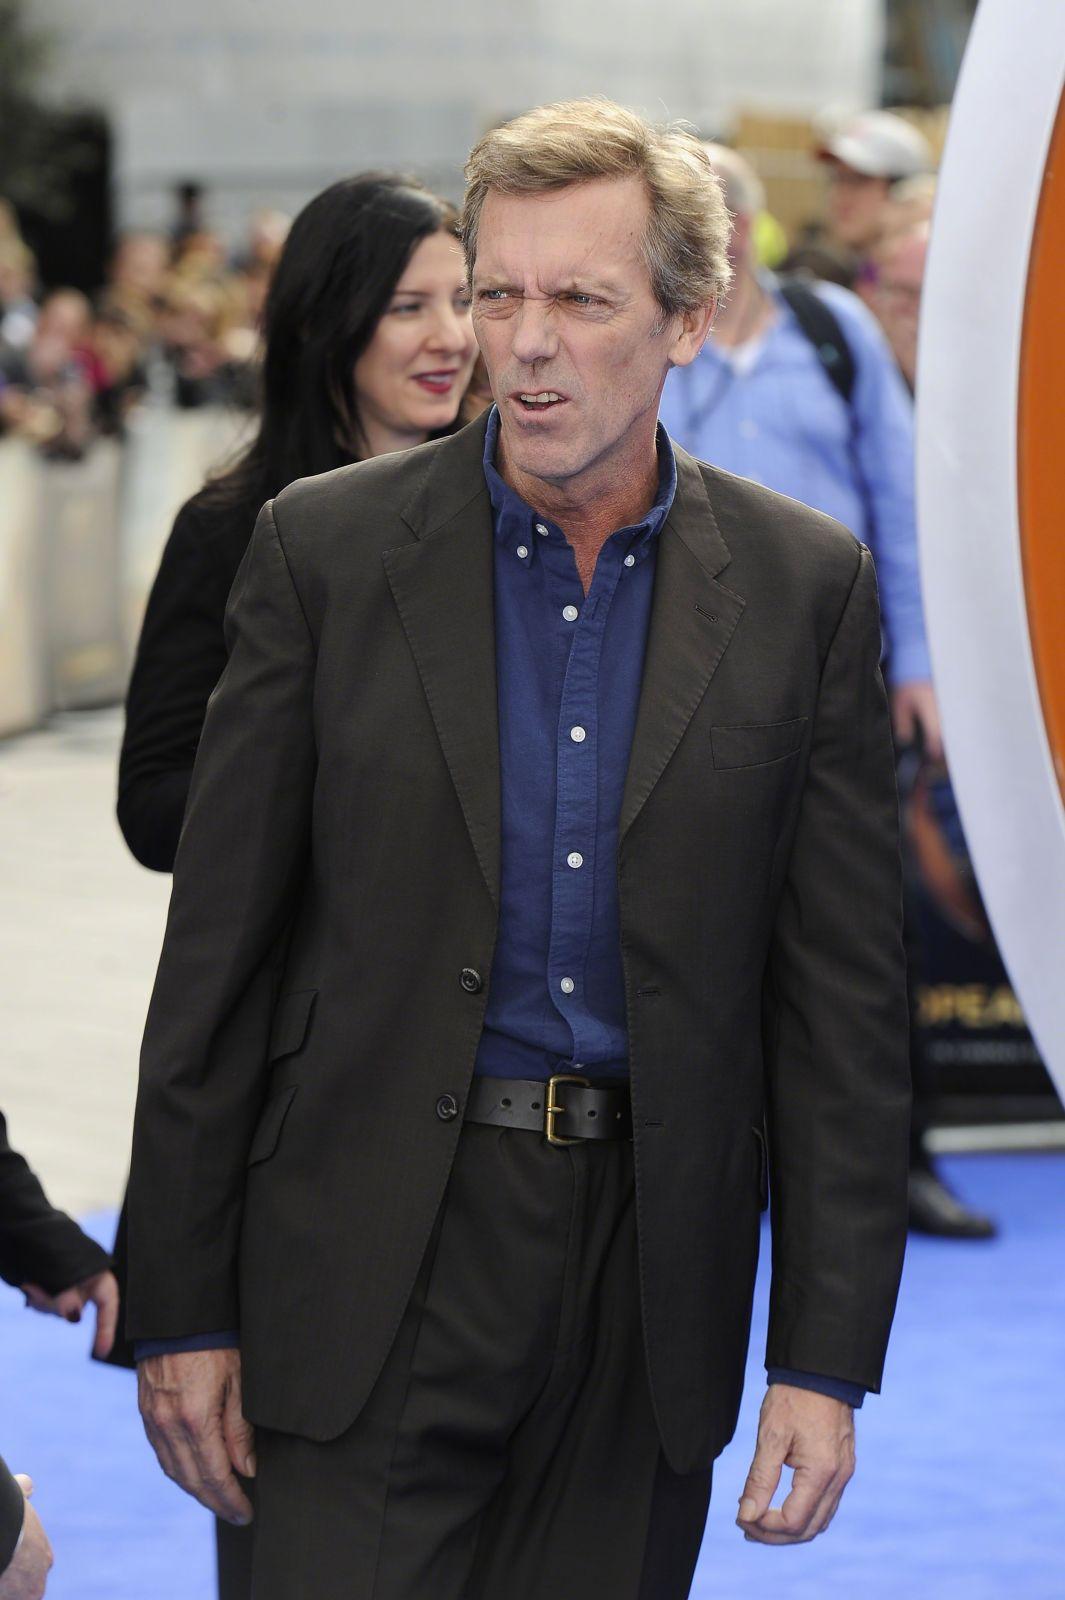 Hugh Laurie 84- Tomorrowland Premiere London 2015.jpg